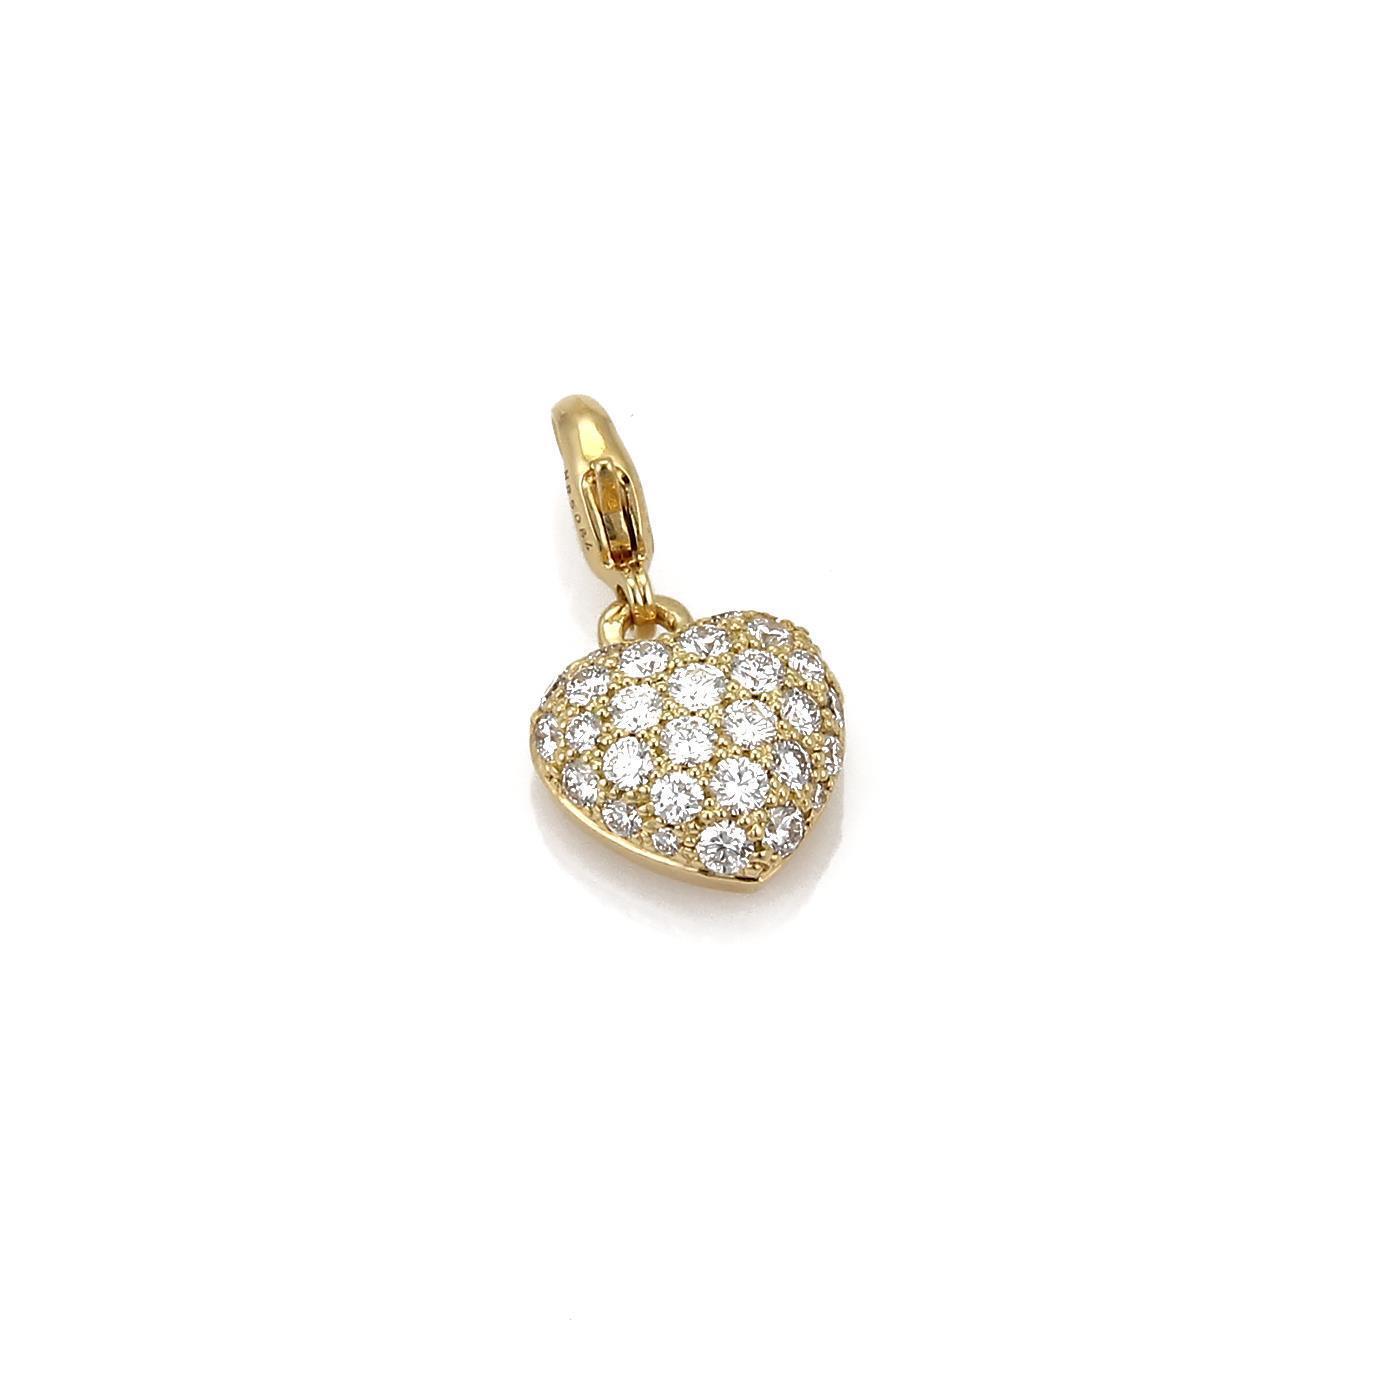 68fc01e19 Pave Diamond 18k gold Heart Charm Pendant Cartier Yellow nvwxrb2881 ...